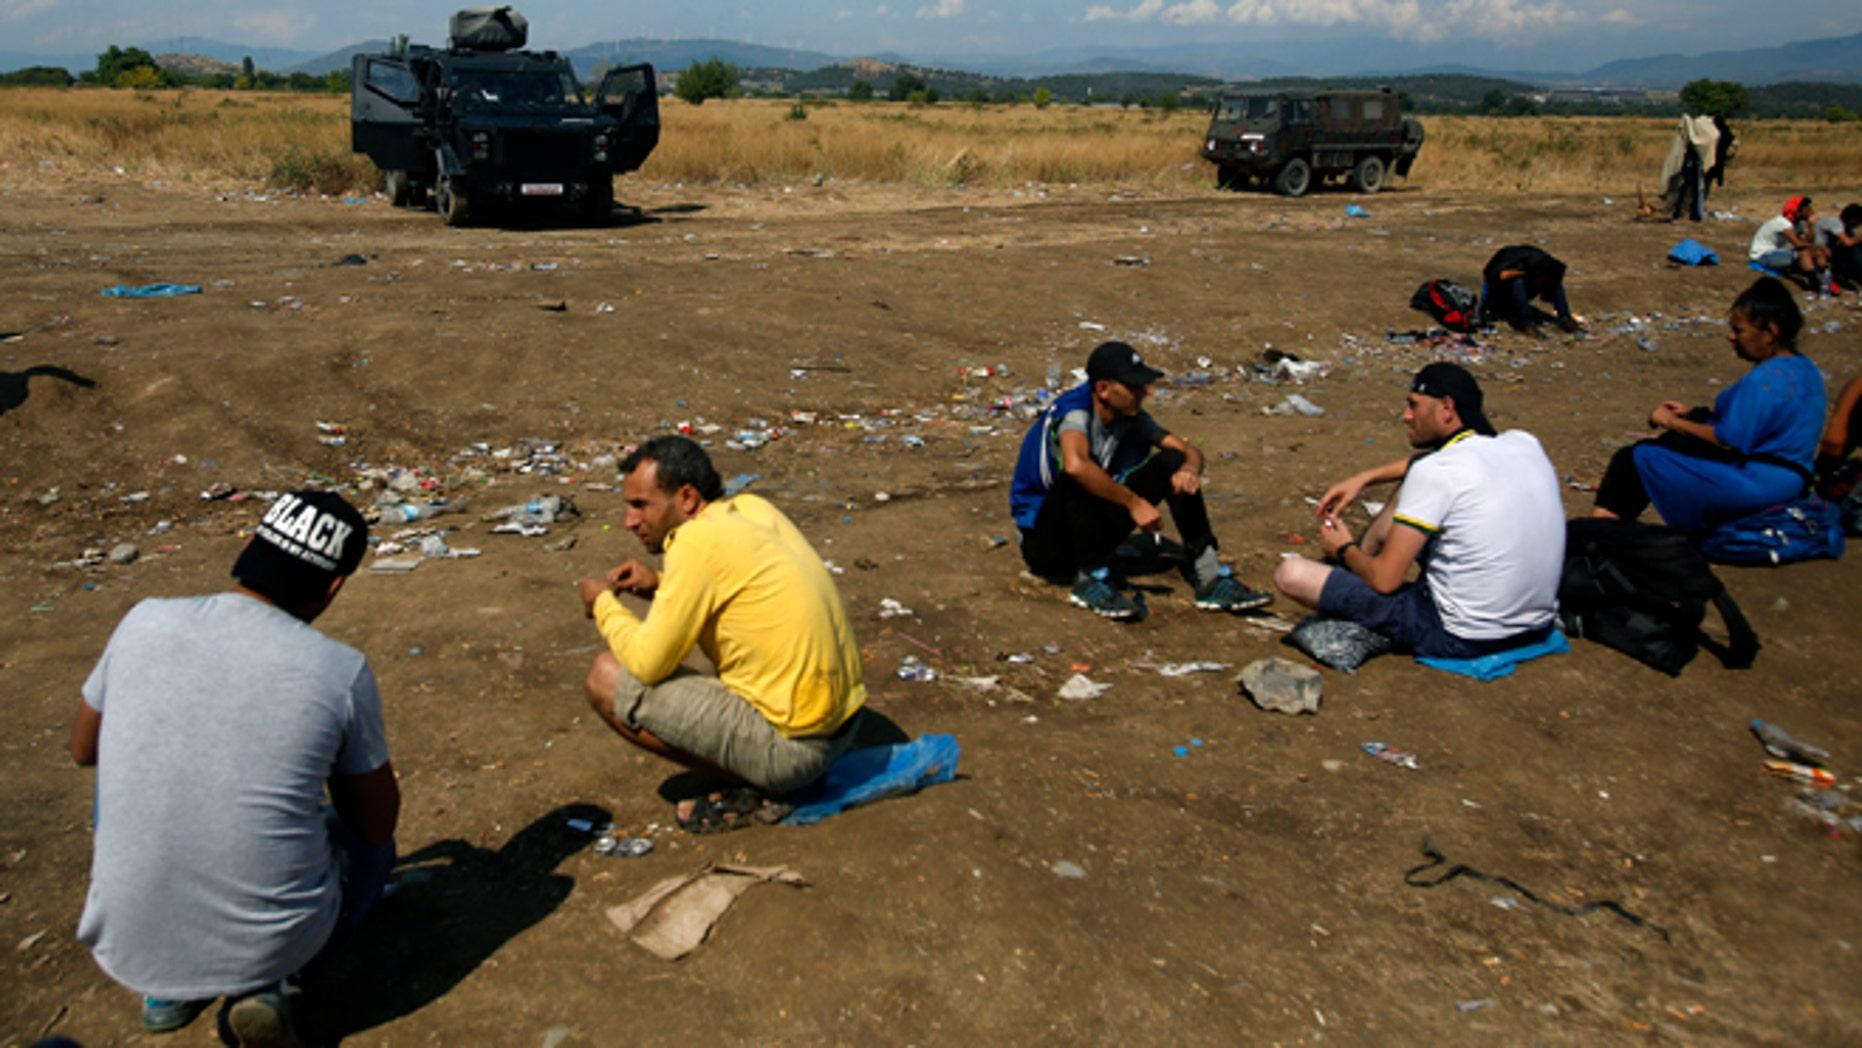 Aug. 20: Macedonian police block migrants at no-man's land between Greece and Macedonia near the southern Macedonian town of Gevgelija.